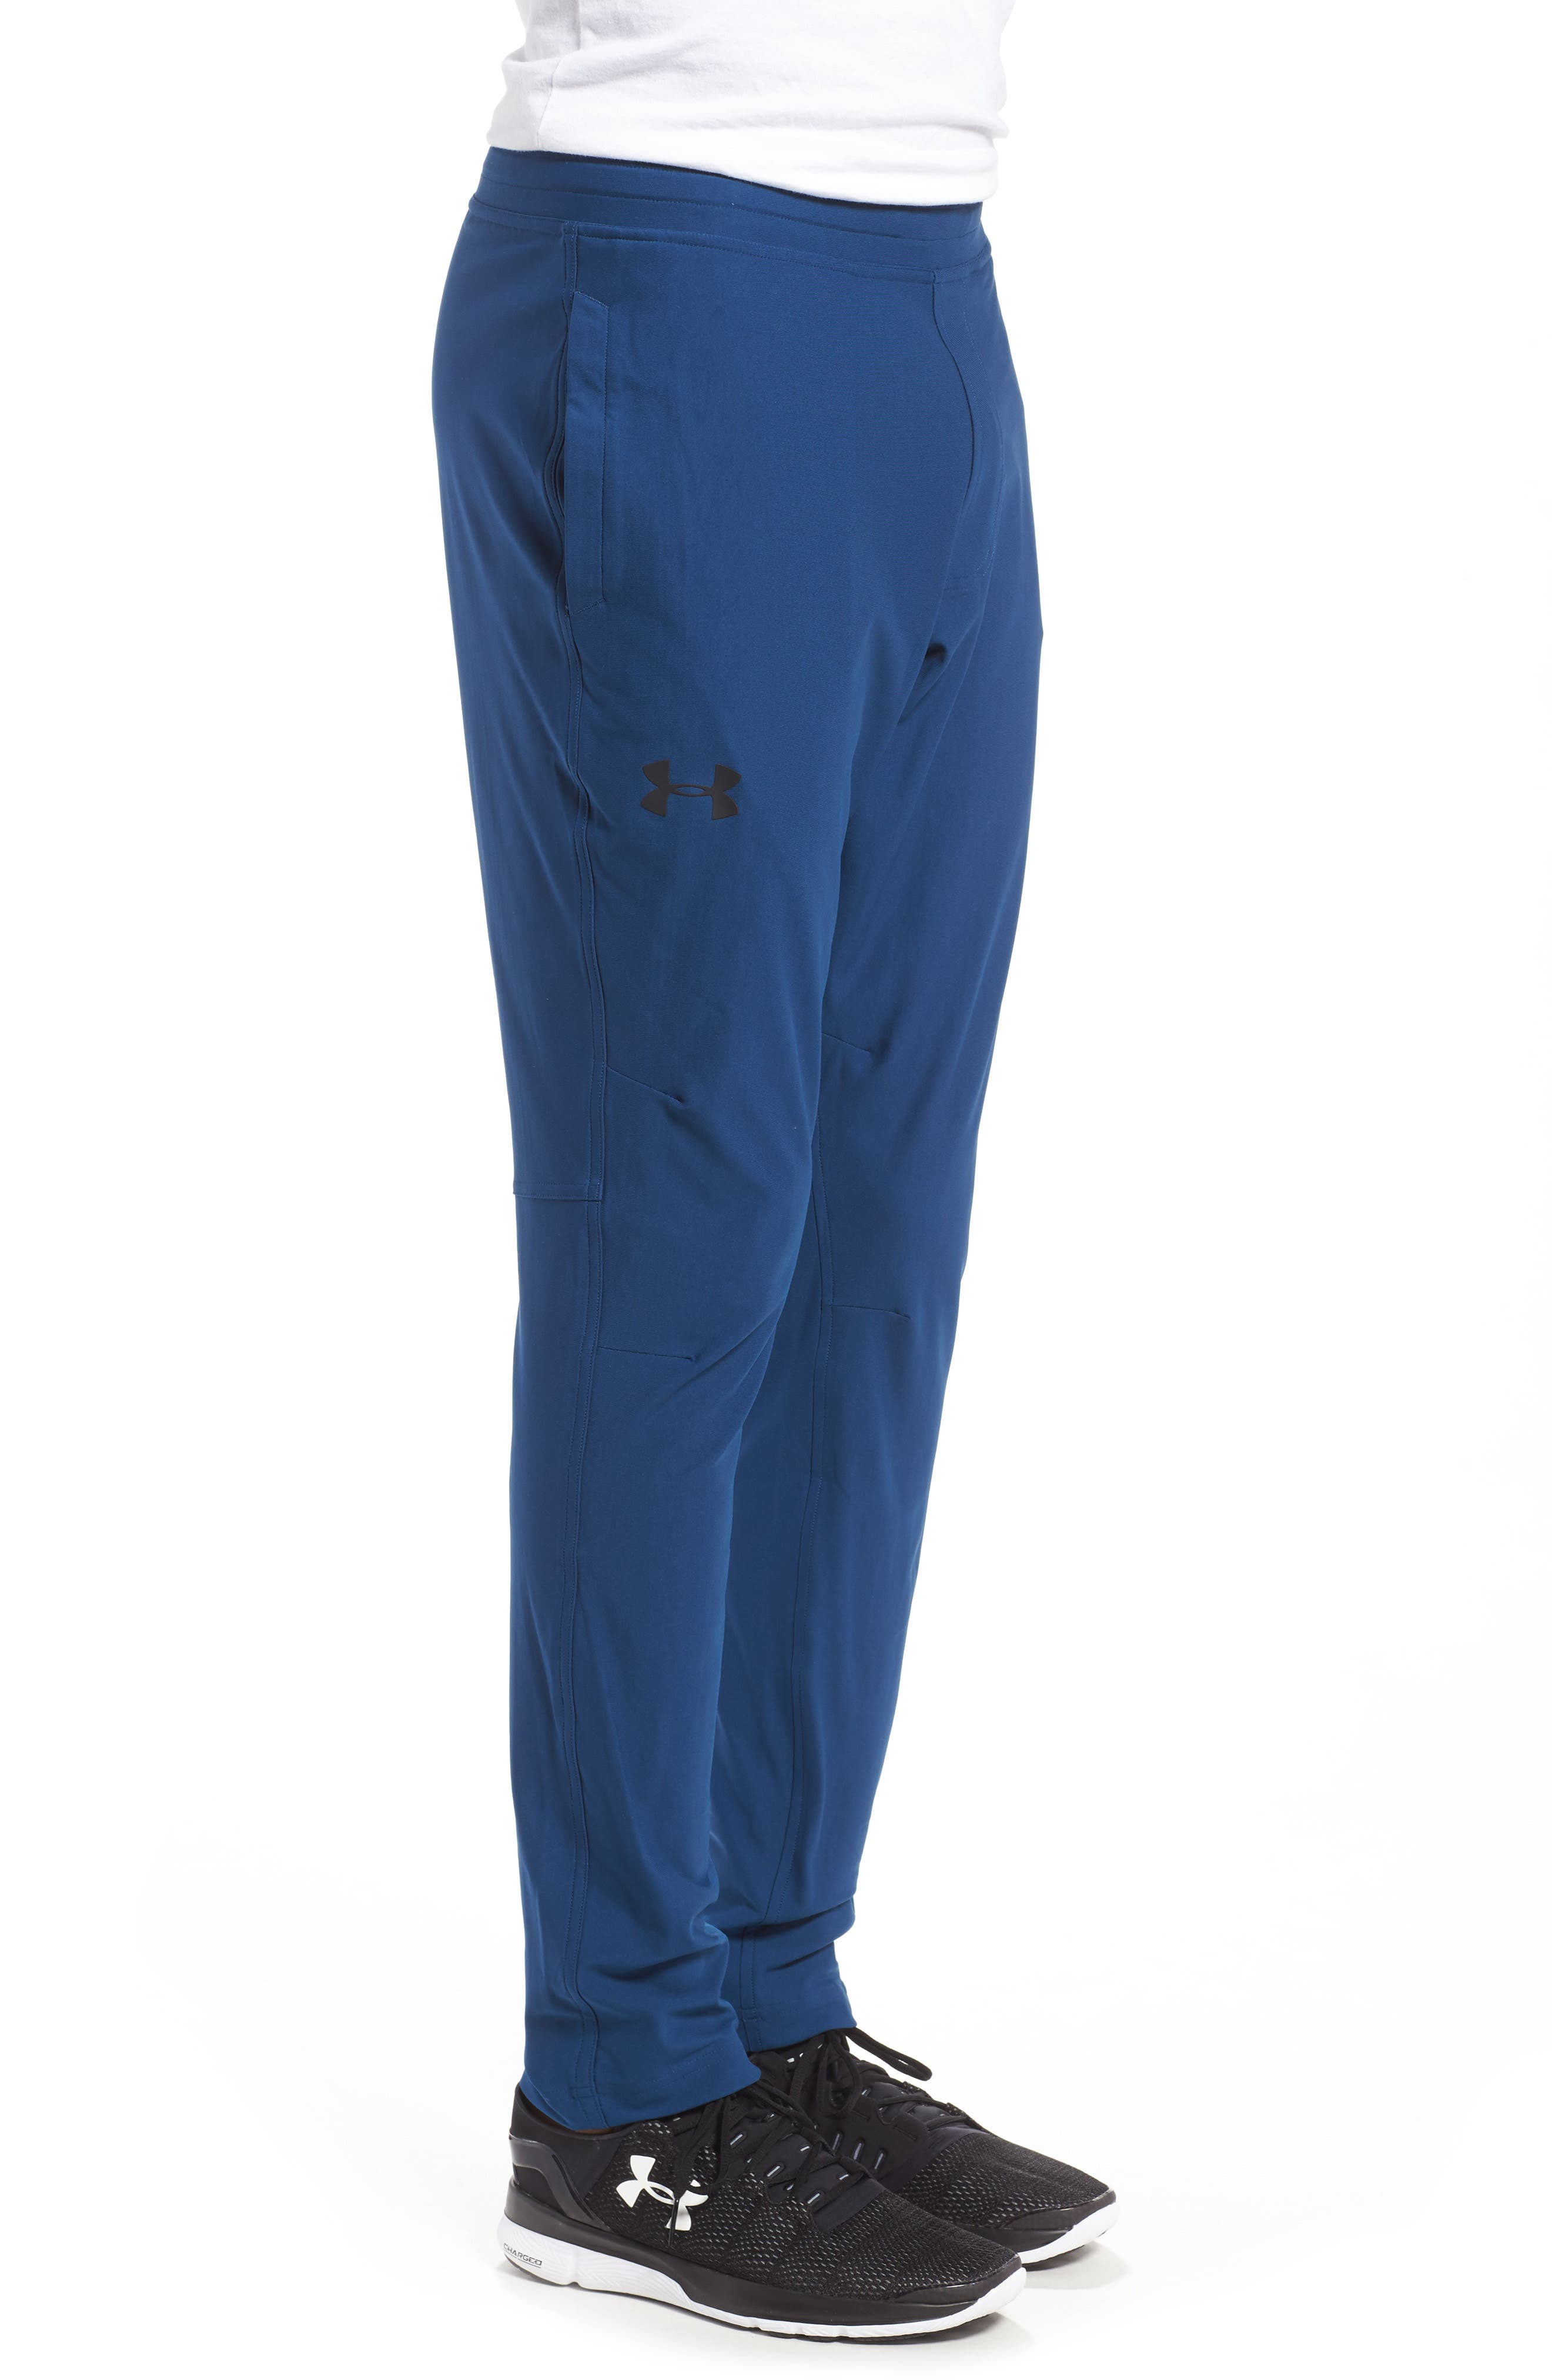 Elevated Pants,                             Alternate thumbnail 3, color,                             Blackout Navy